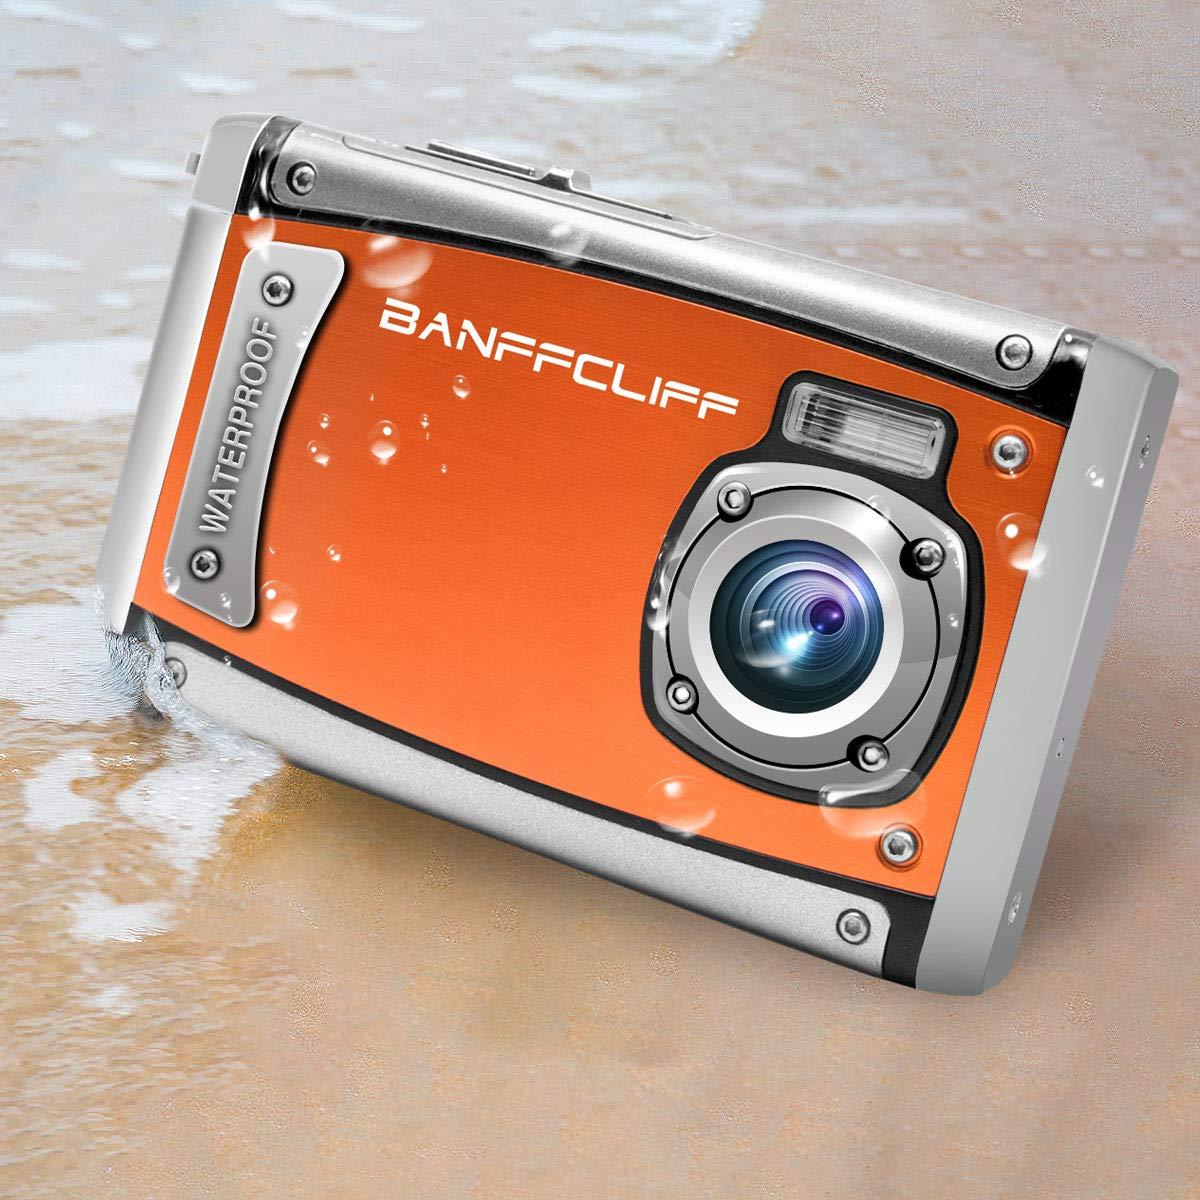 BanffCliff 21MP 1080P Underwater Digital Camera, 3 Meter Waterproof Action Cam, 2.4'' LCD Screen Flash Mic IP68 Camcorder, 8X Digital Zoom Anti-Shock Water Sports Video Recorder